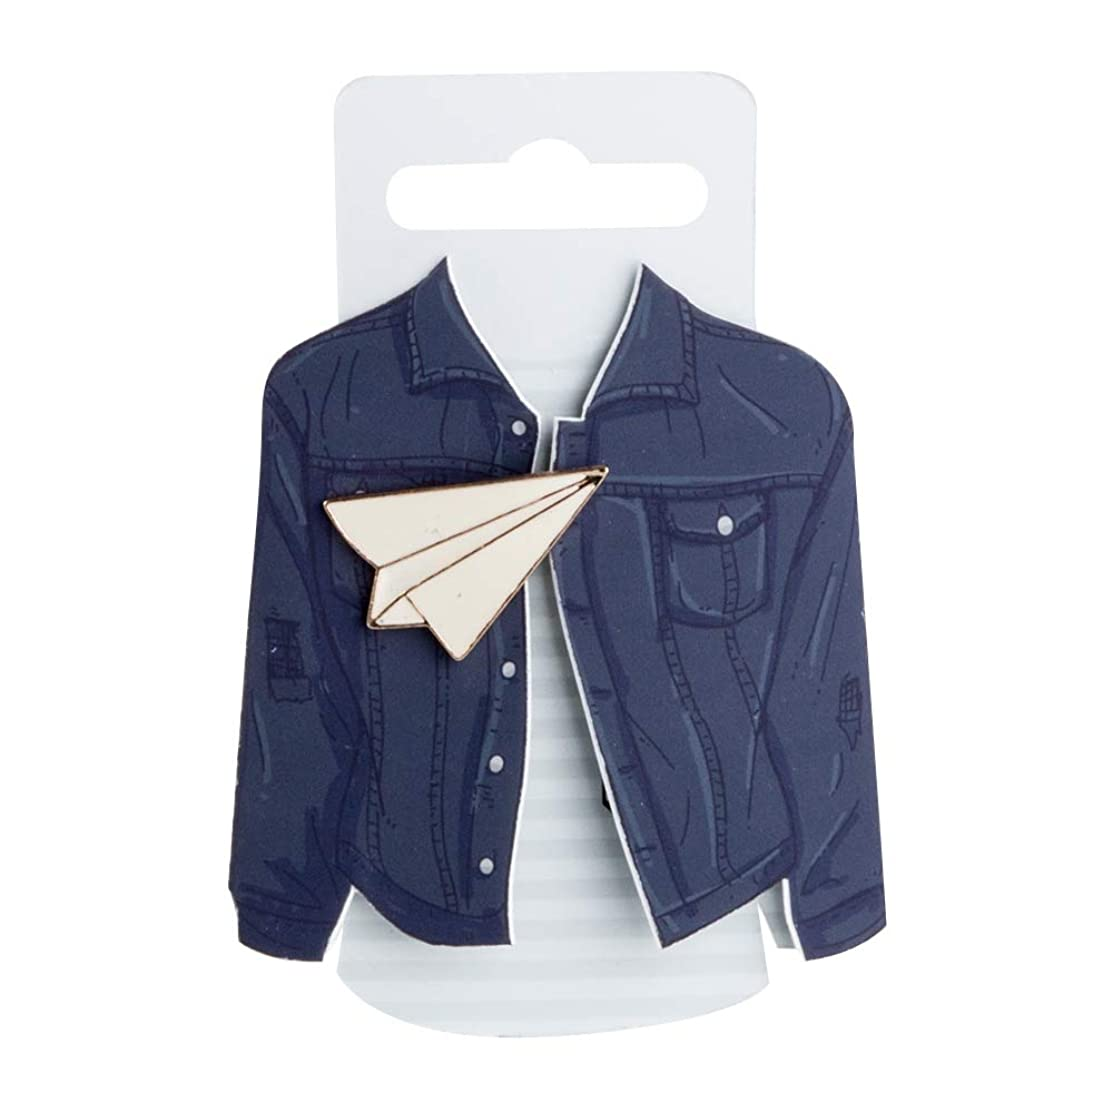 Good Design Works Enamel Pin-Paper Plane, White